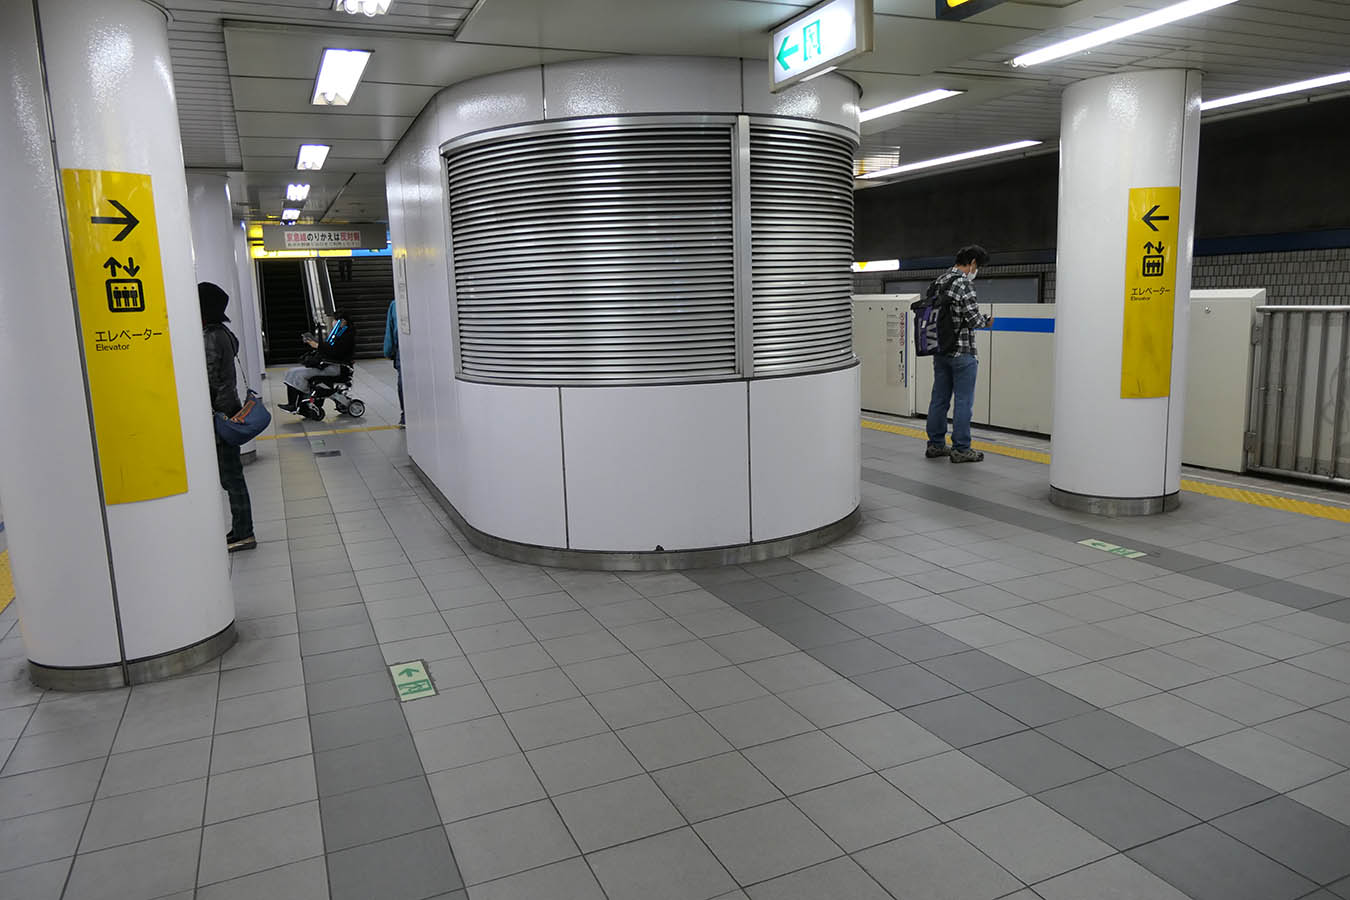 YMS-B11_photo02.jpg